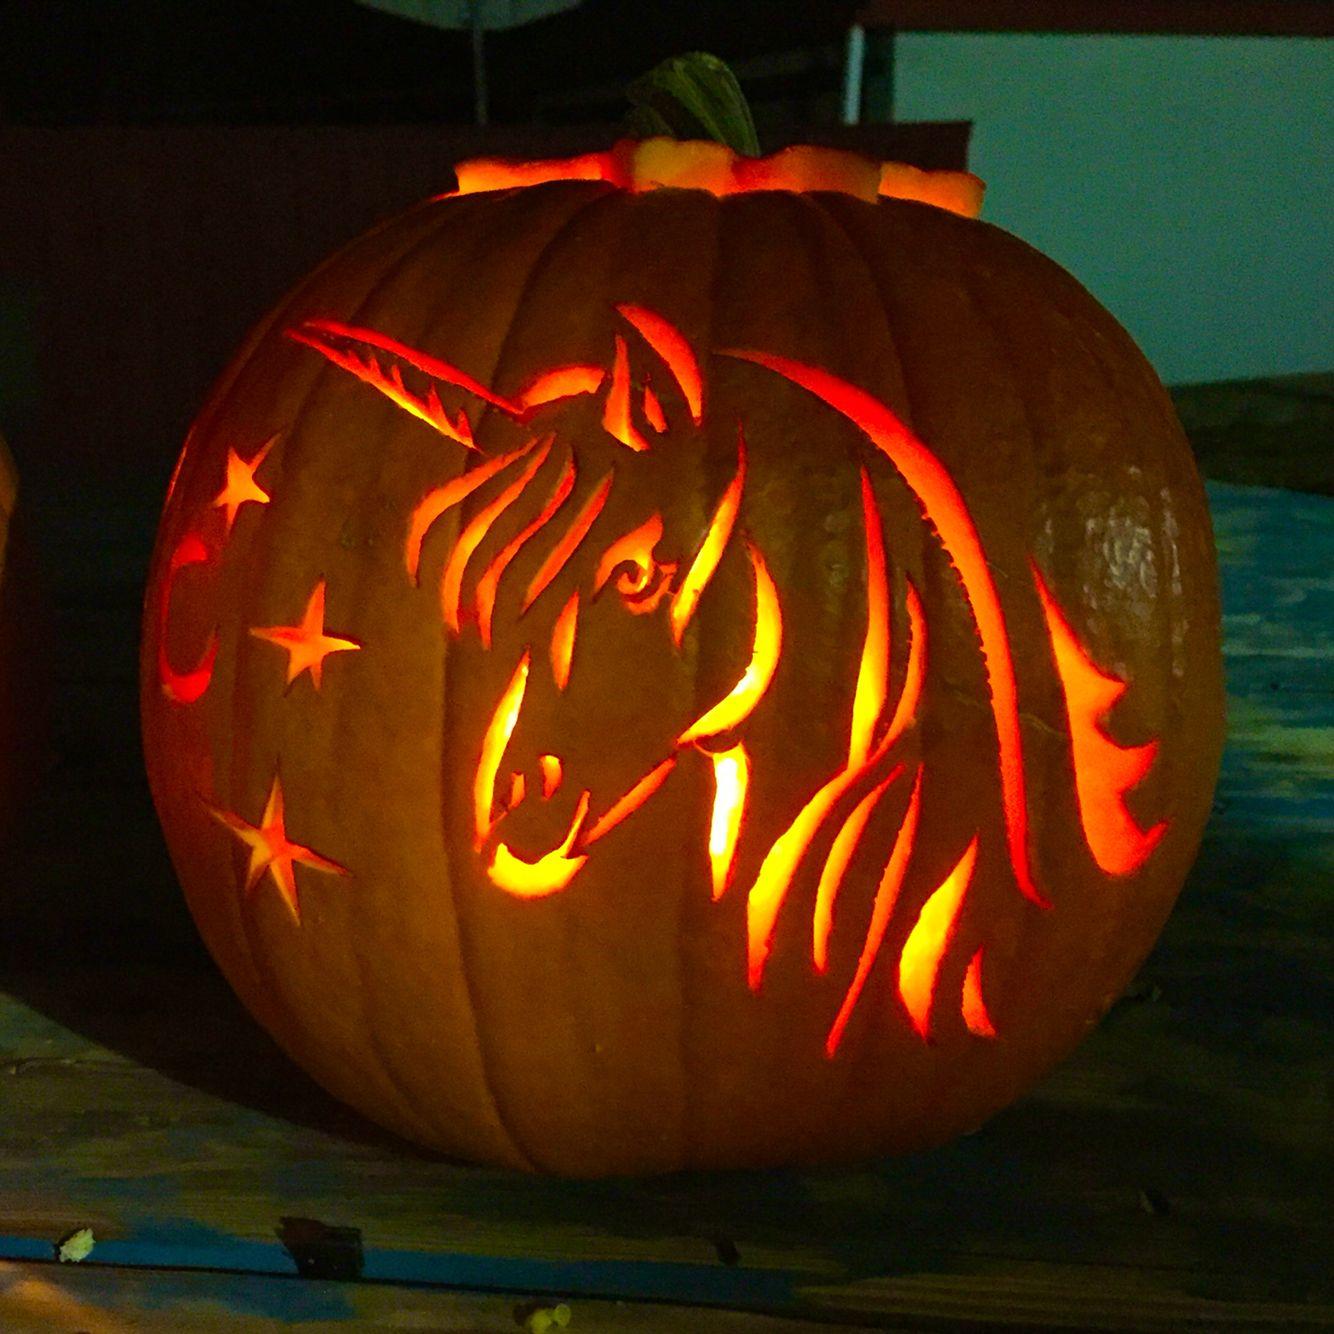 disney pumpkin carving kit. unicorn pumpkin carving disney kit